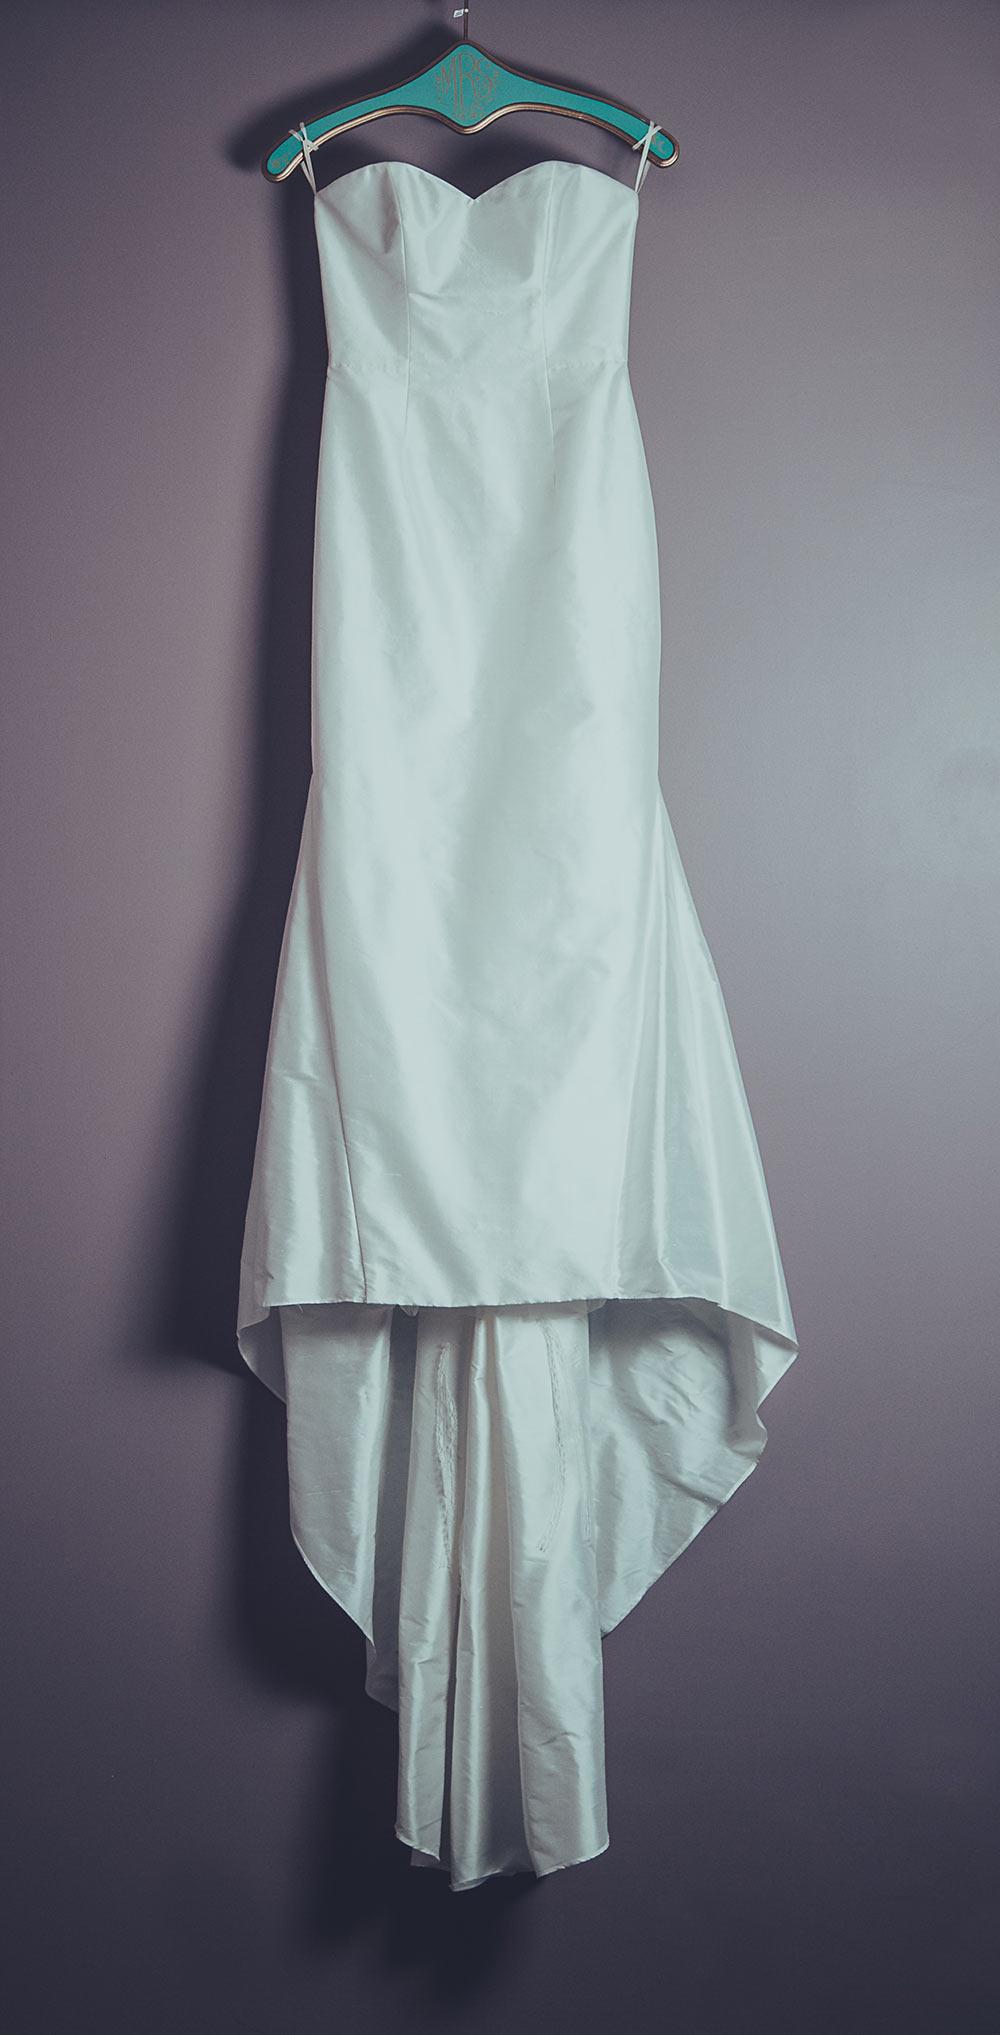 shooting the wedding dress (3)